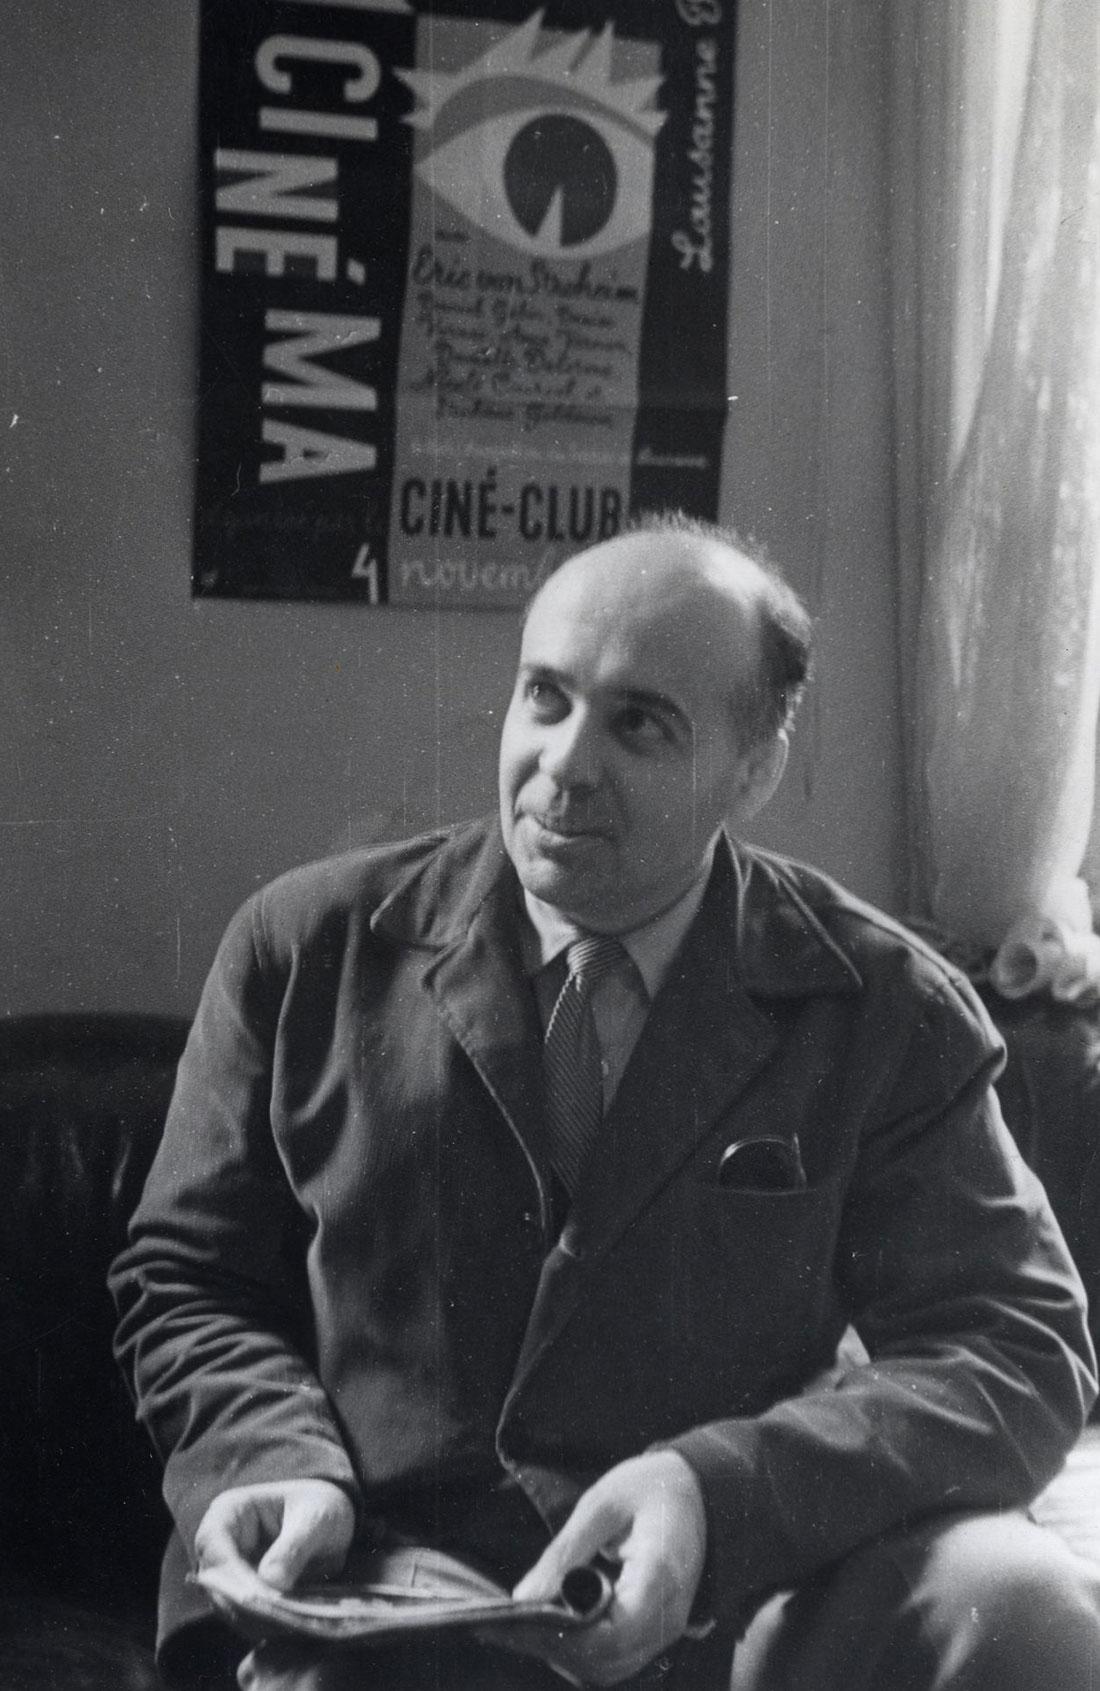 Vladimir Pogacic